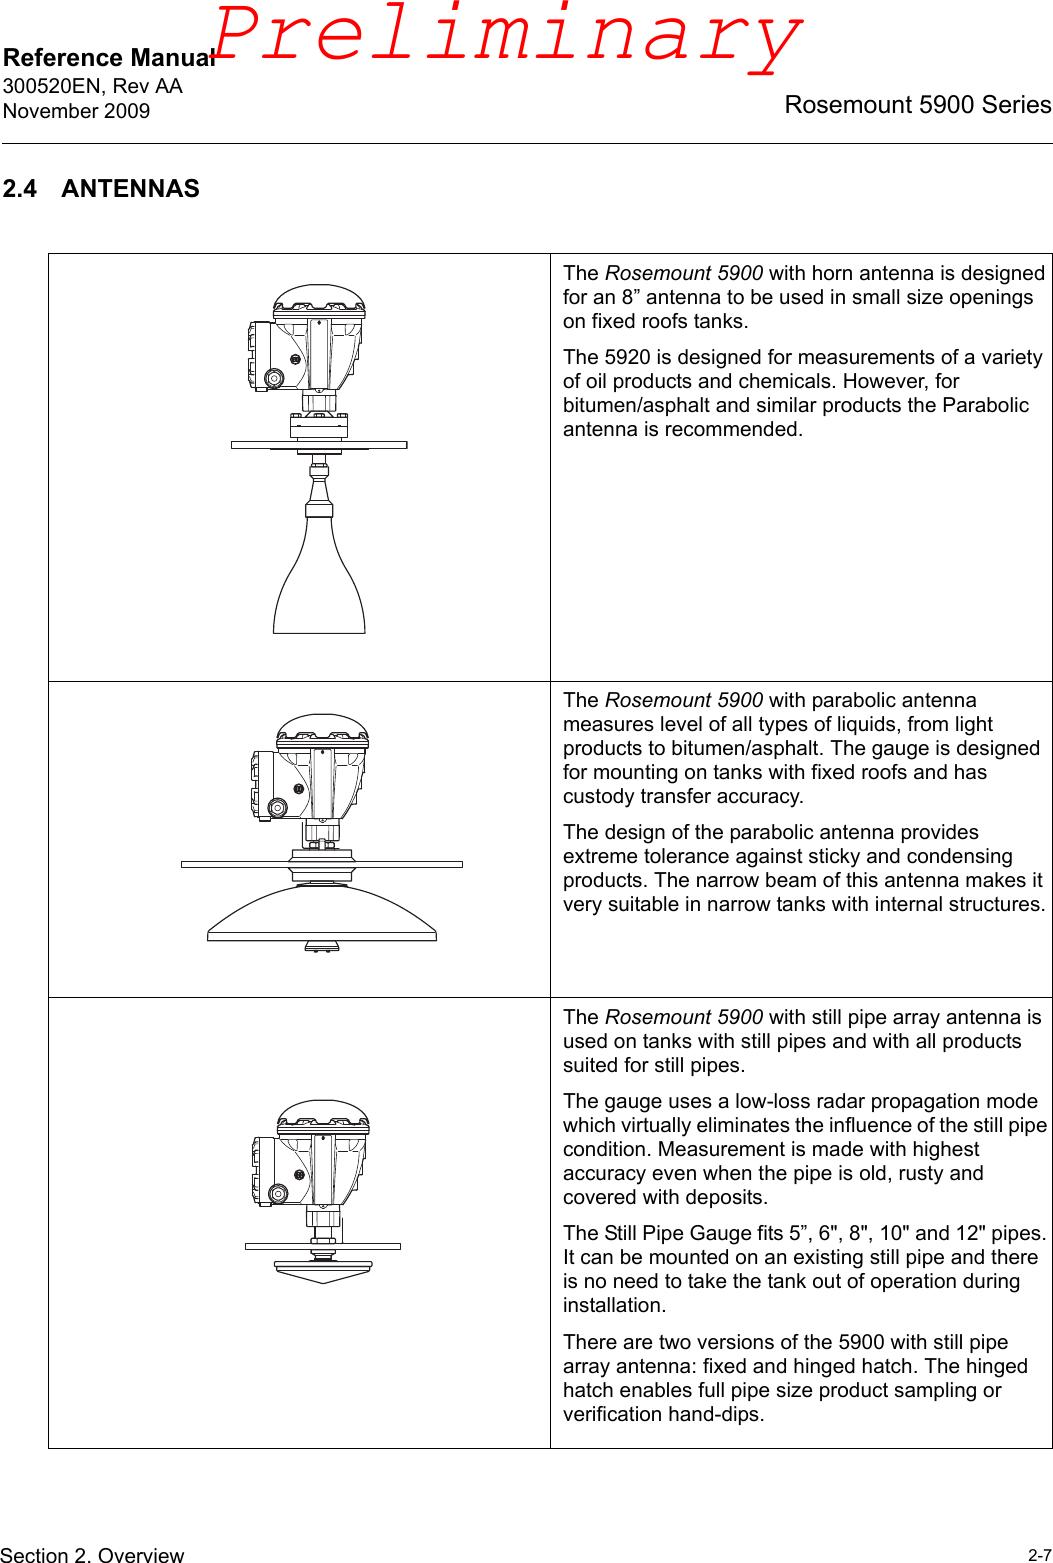 Emerson Rosemount 3301ha1p1n4ae0306rae5ai53 Level And Manual Guide